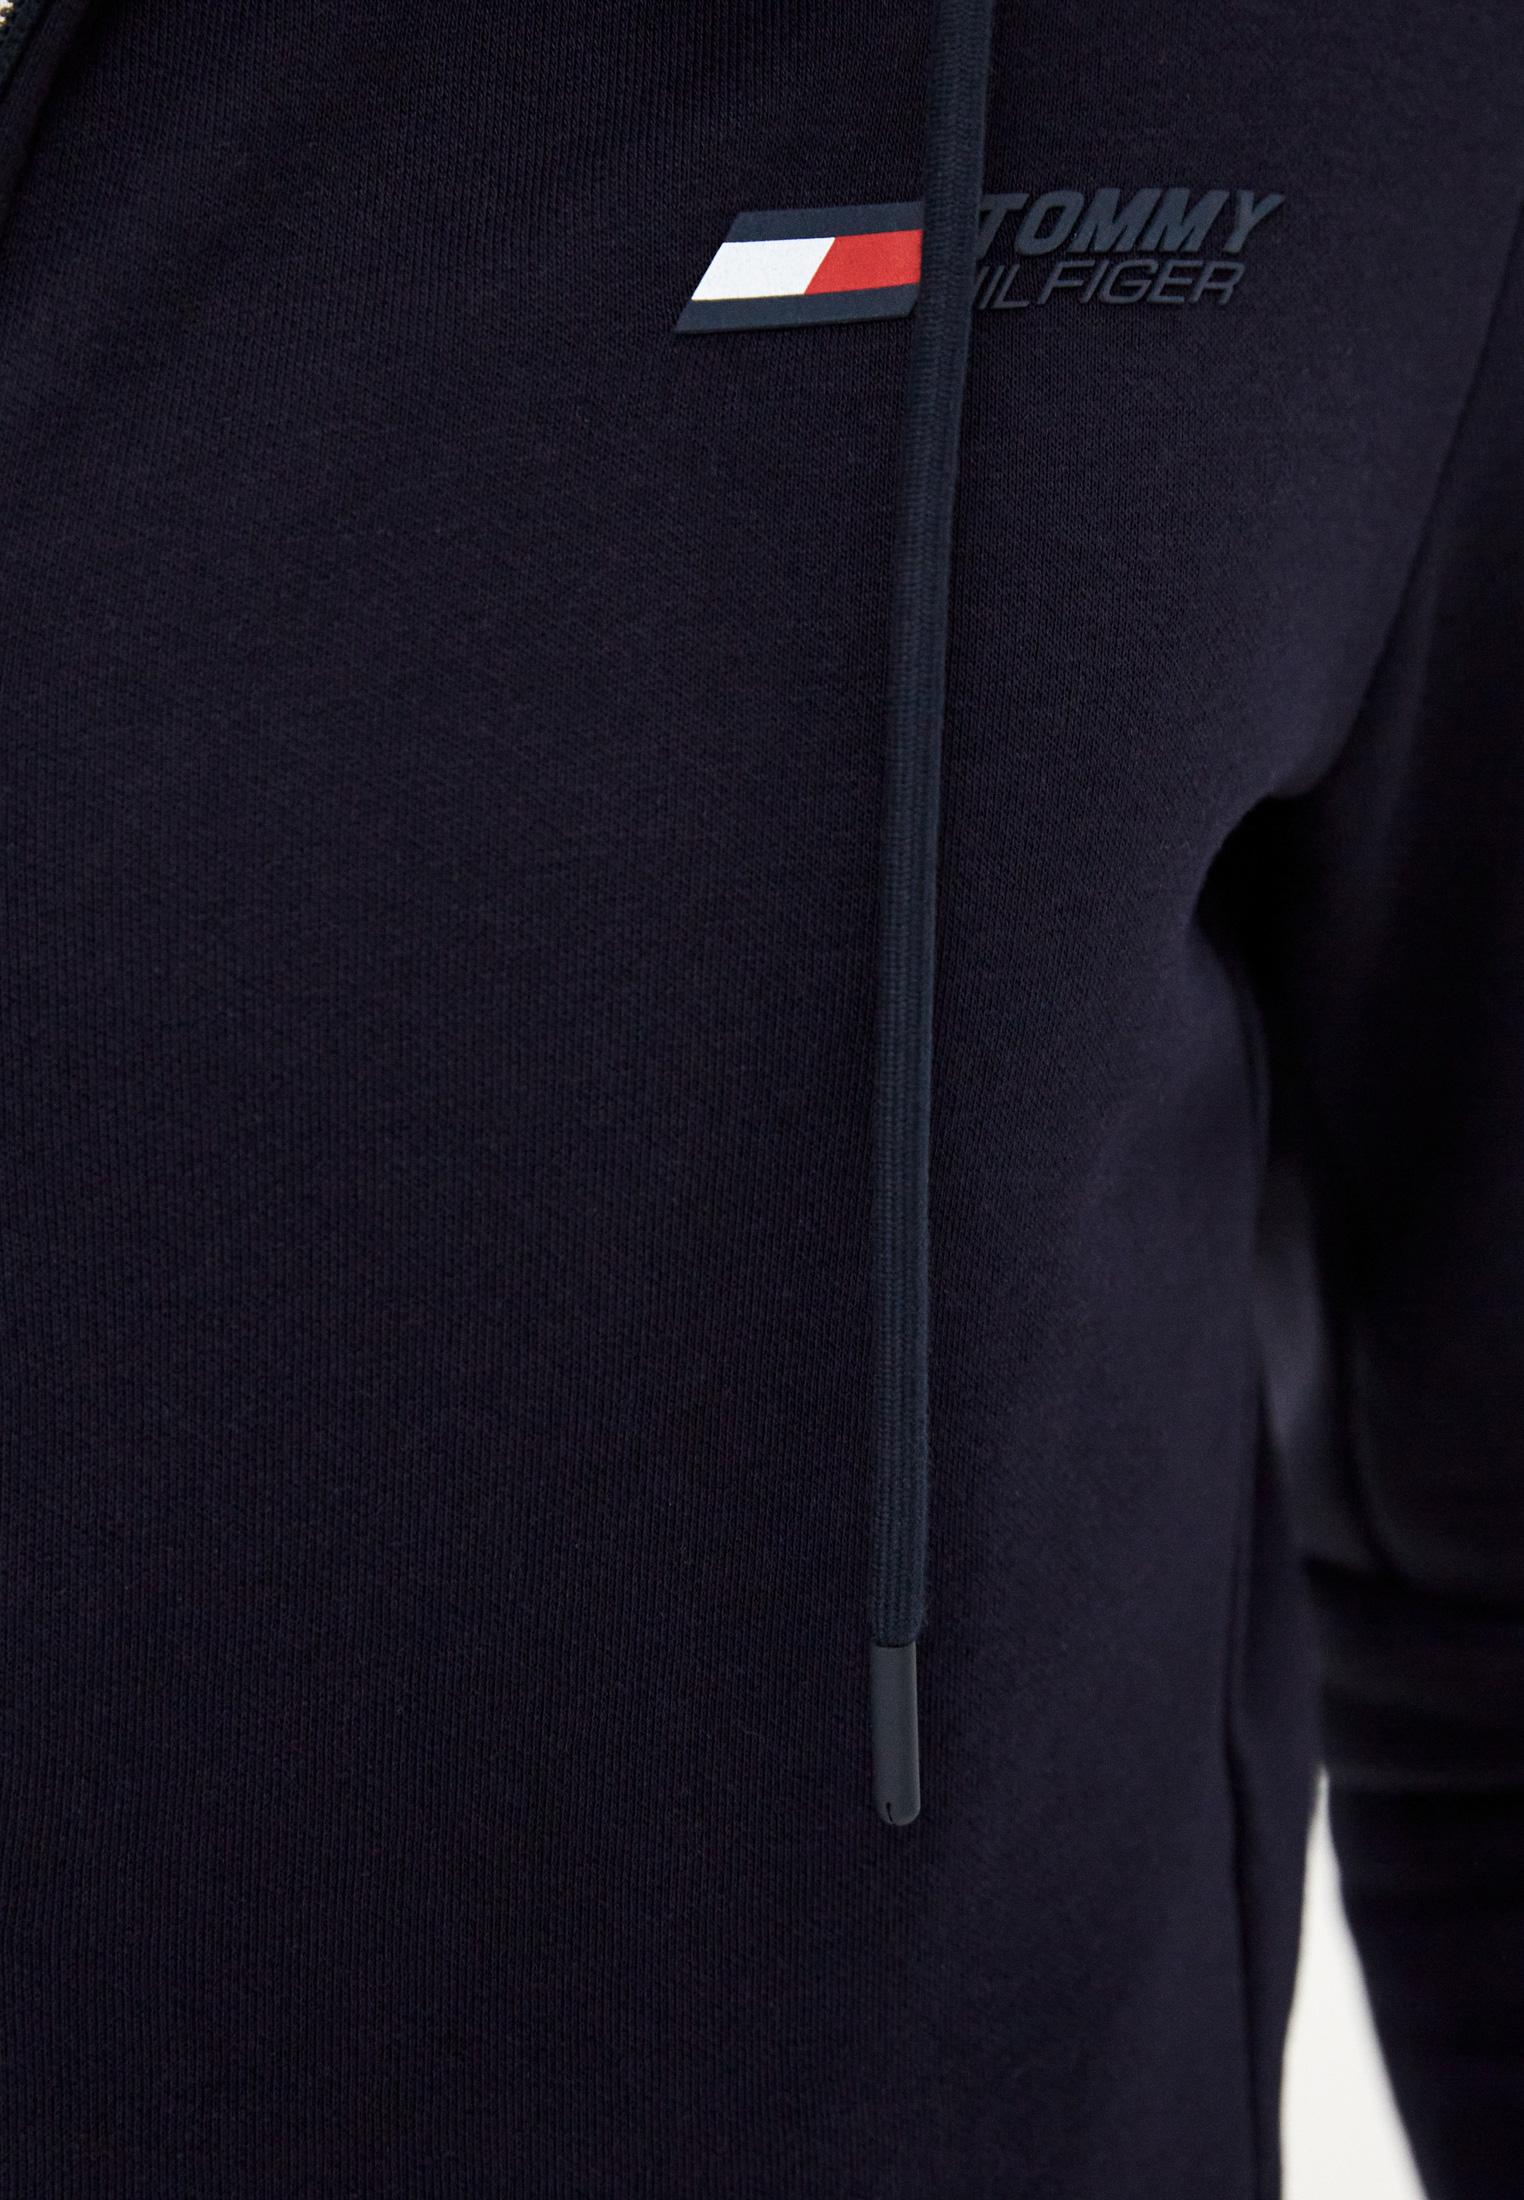 Толстовка Tommy Hilfiger (Томми Хилфигер) MW0MW17256: изображение 4